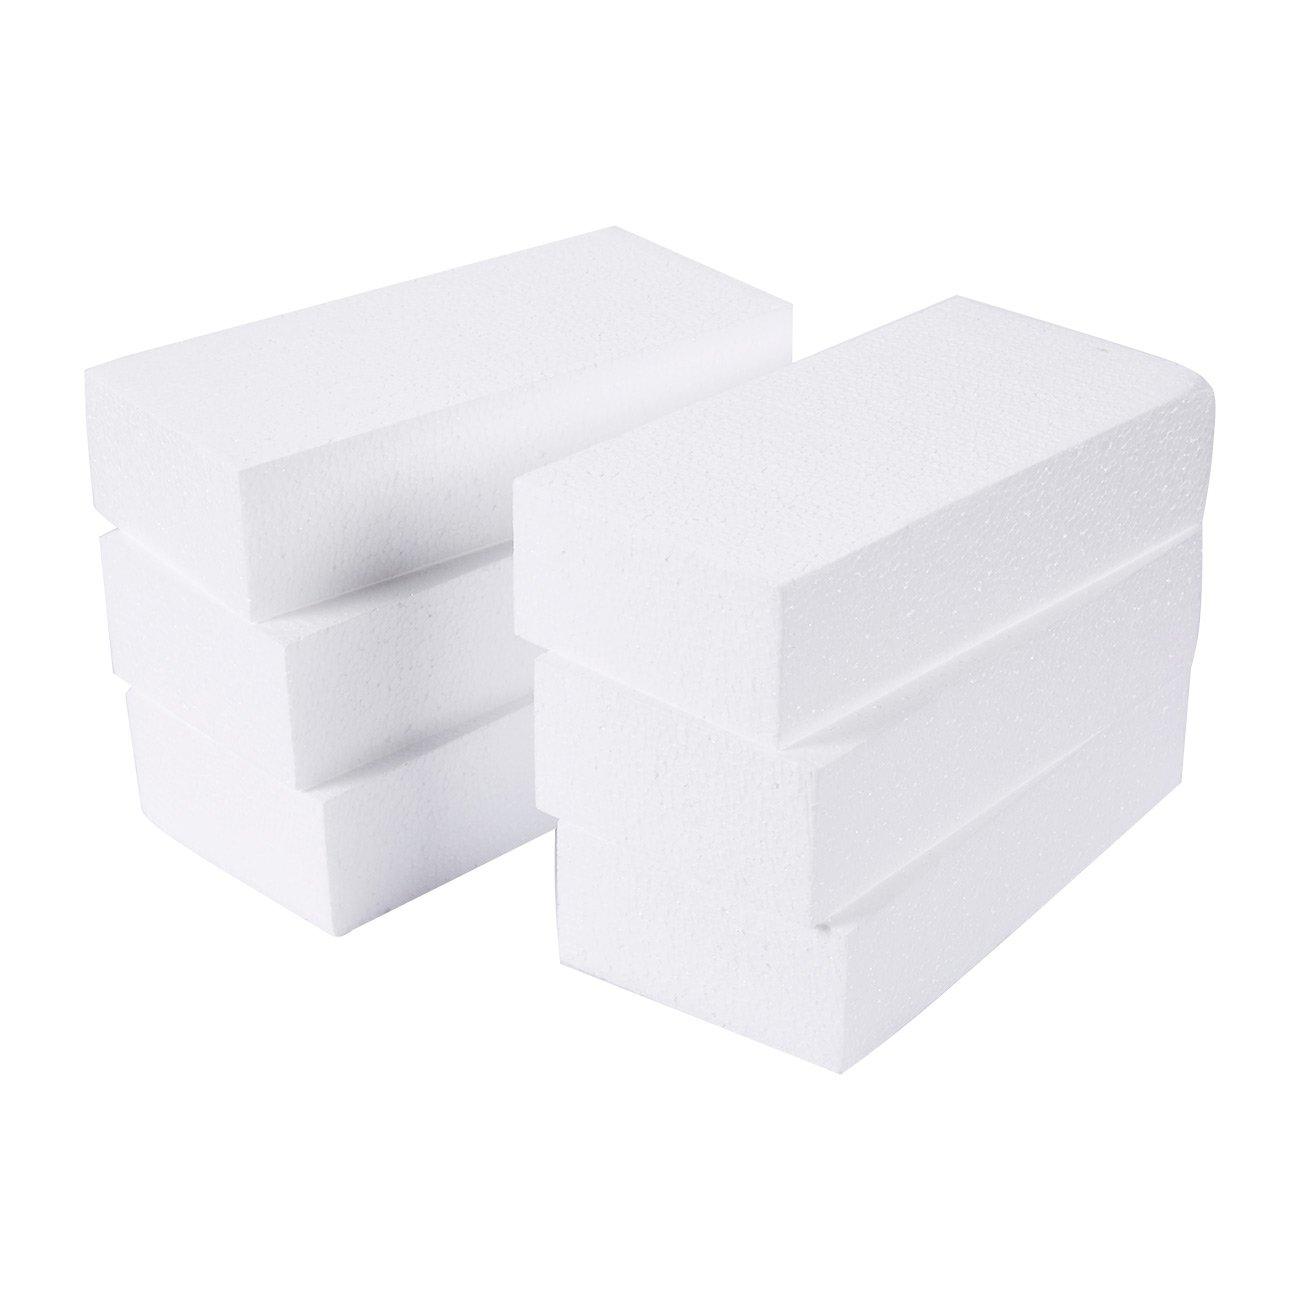 Craft Foam Block - 6-Pack Rectangle Polystyrene Foam Brick - Styrofoam Blocks for Sculpture, Modeling, DIY Arts and Crafts - White, 8 x 4 x 2 inches